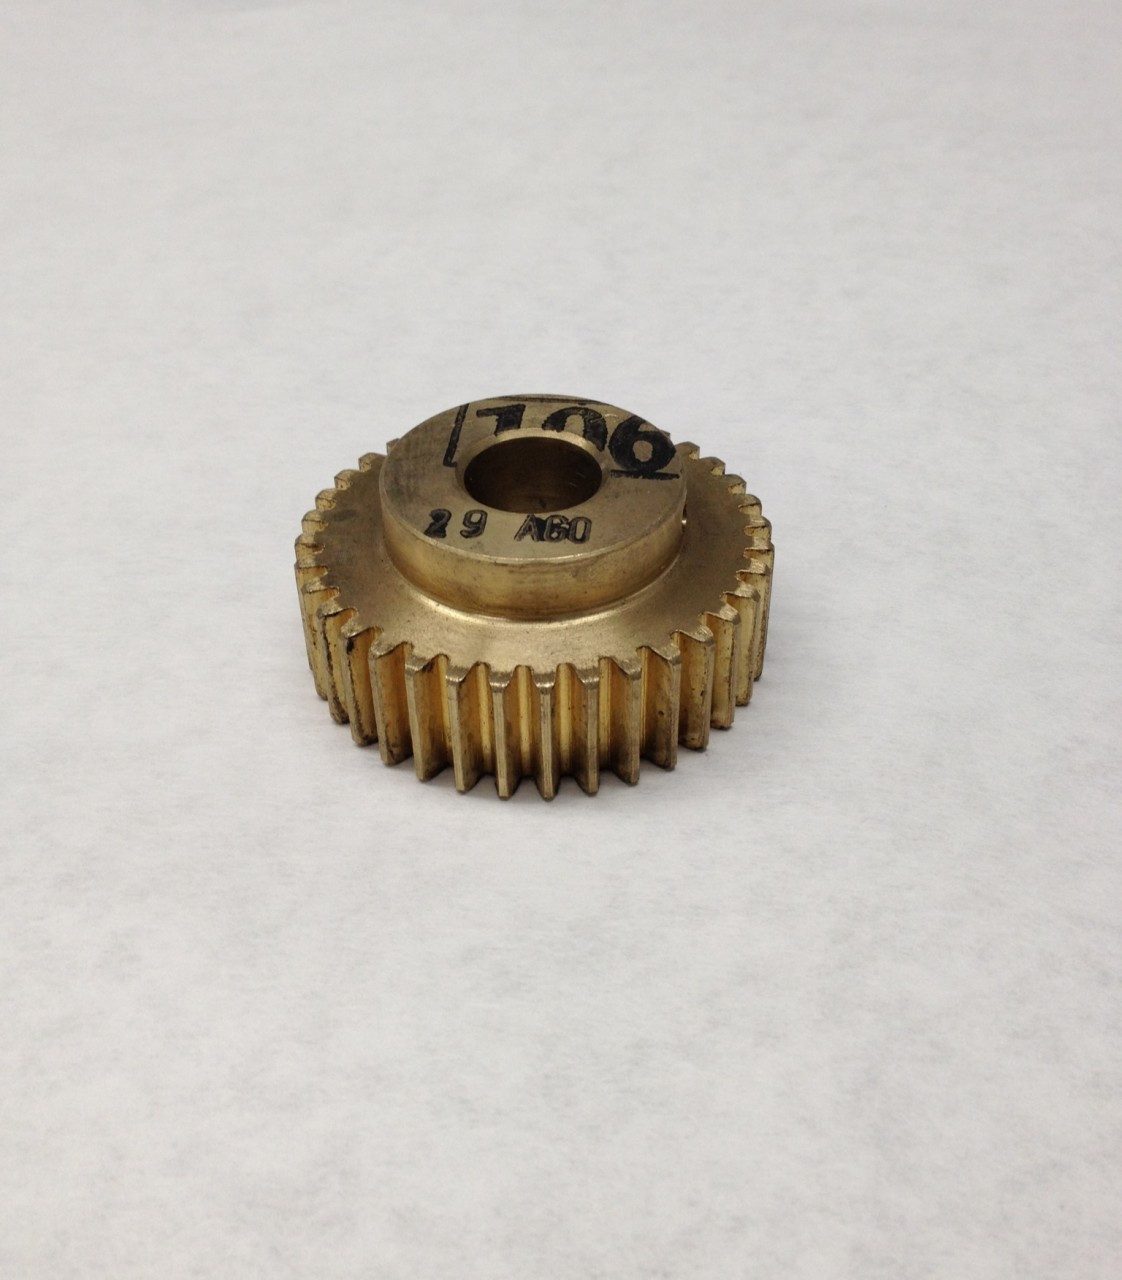 TorRey MT-43 - Gear - 05-02218